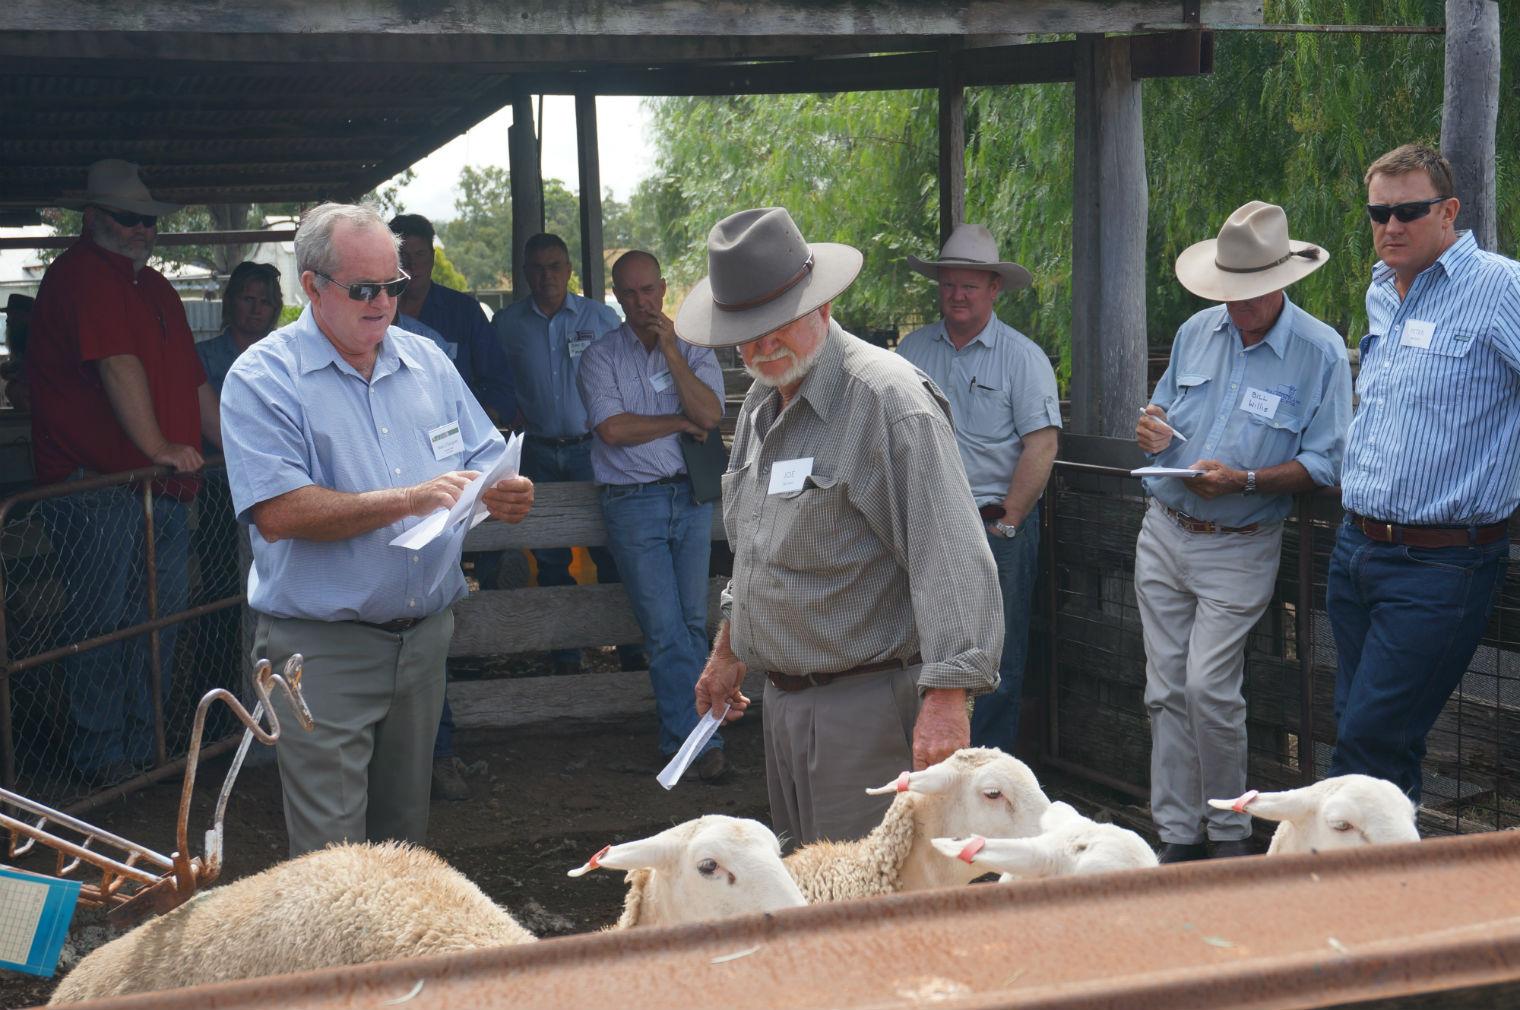 2015.4.1-Lamb-Workshop-Artunga-3-rs.jpg